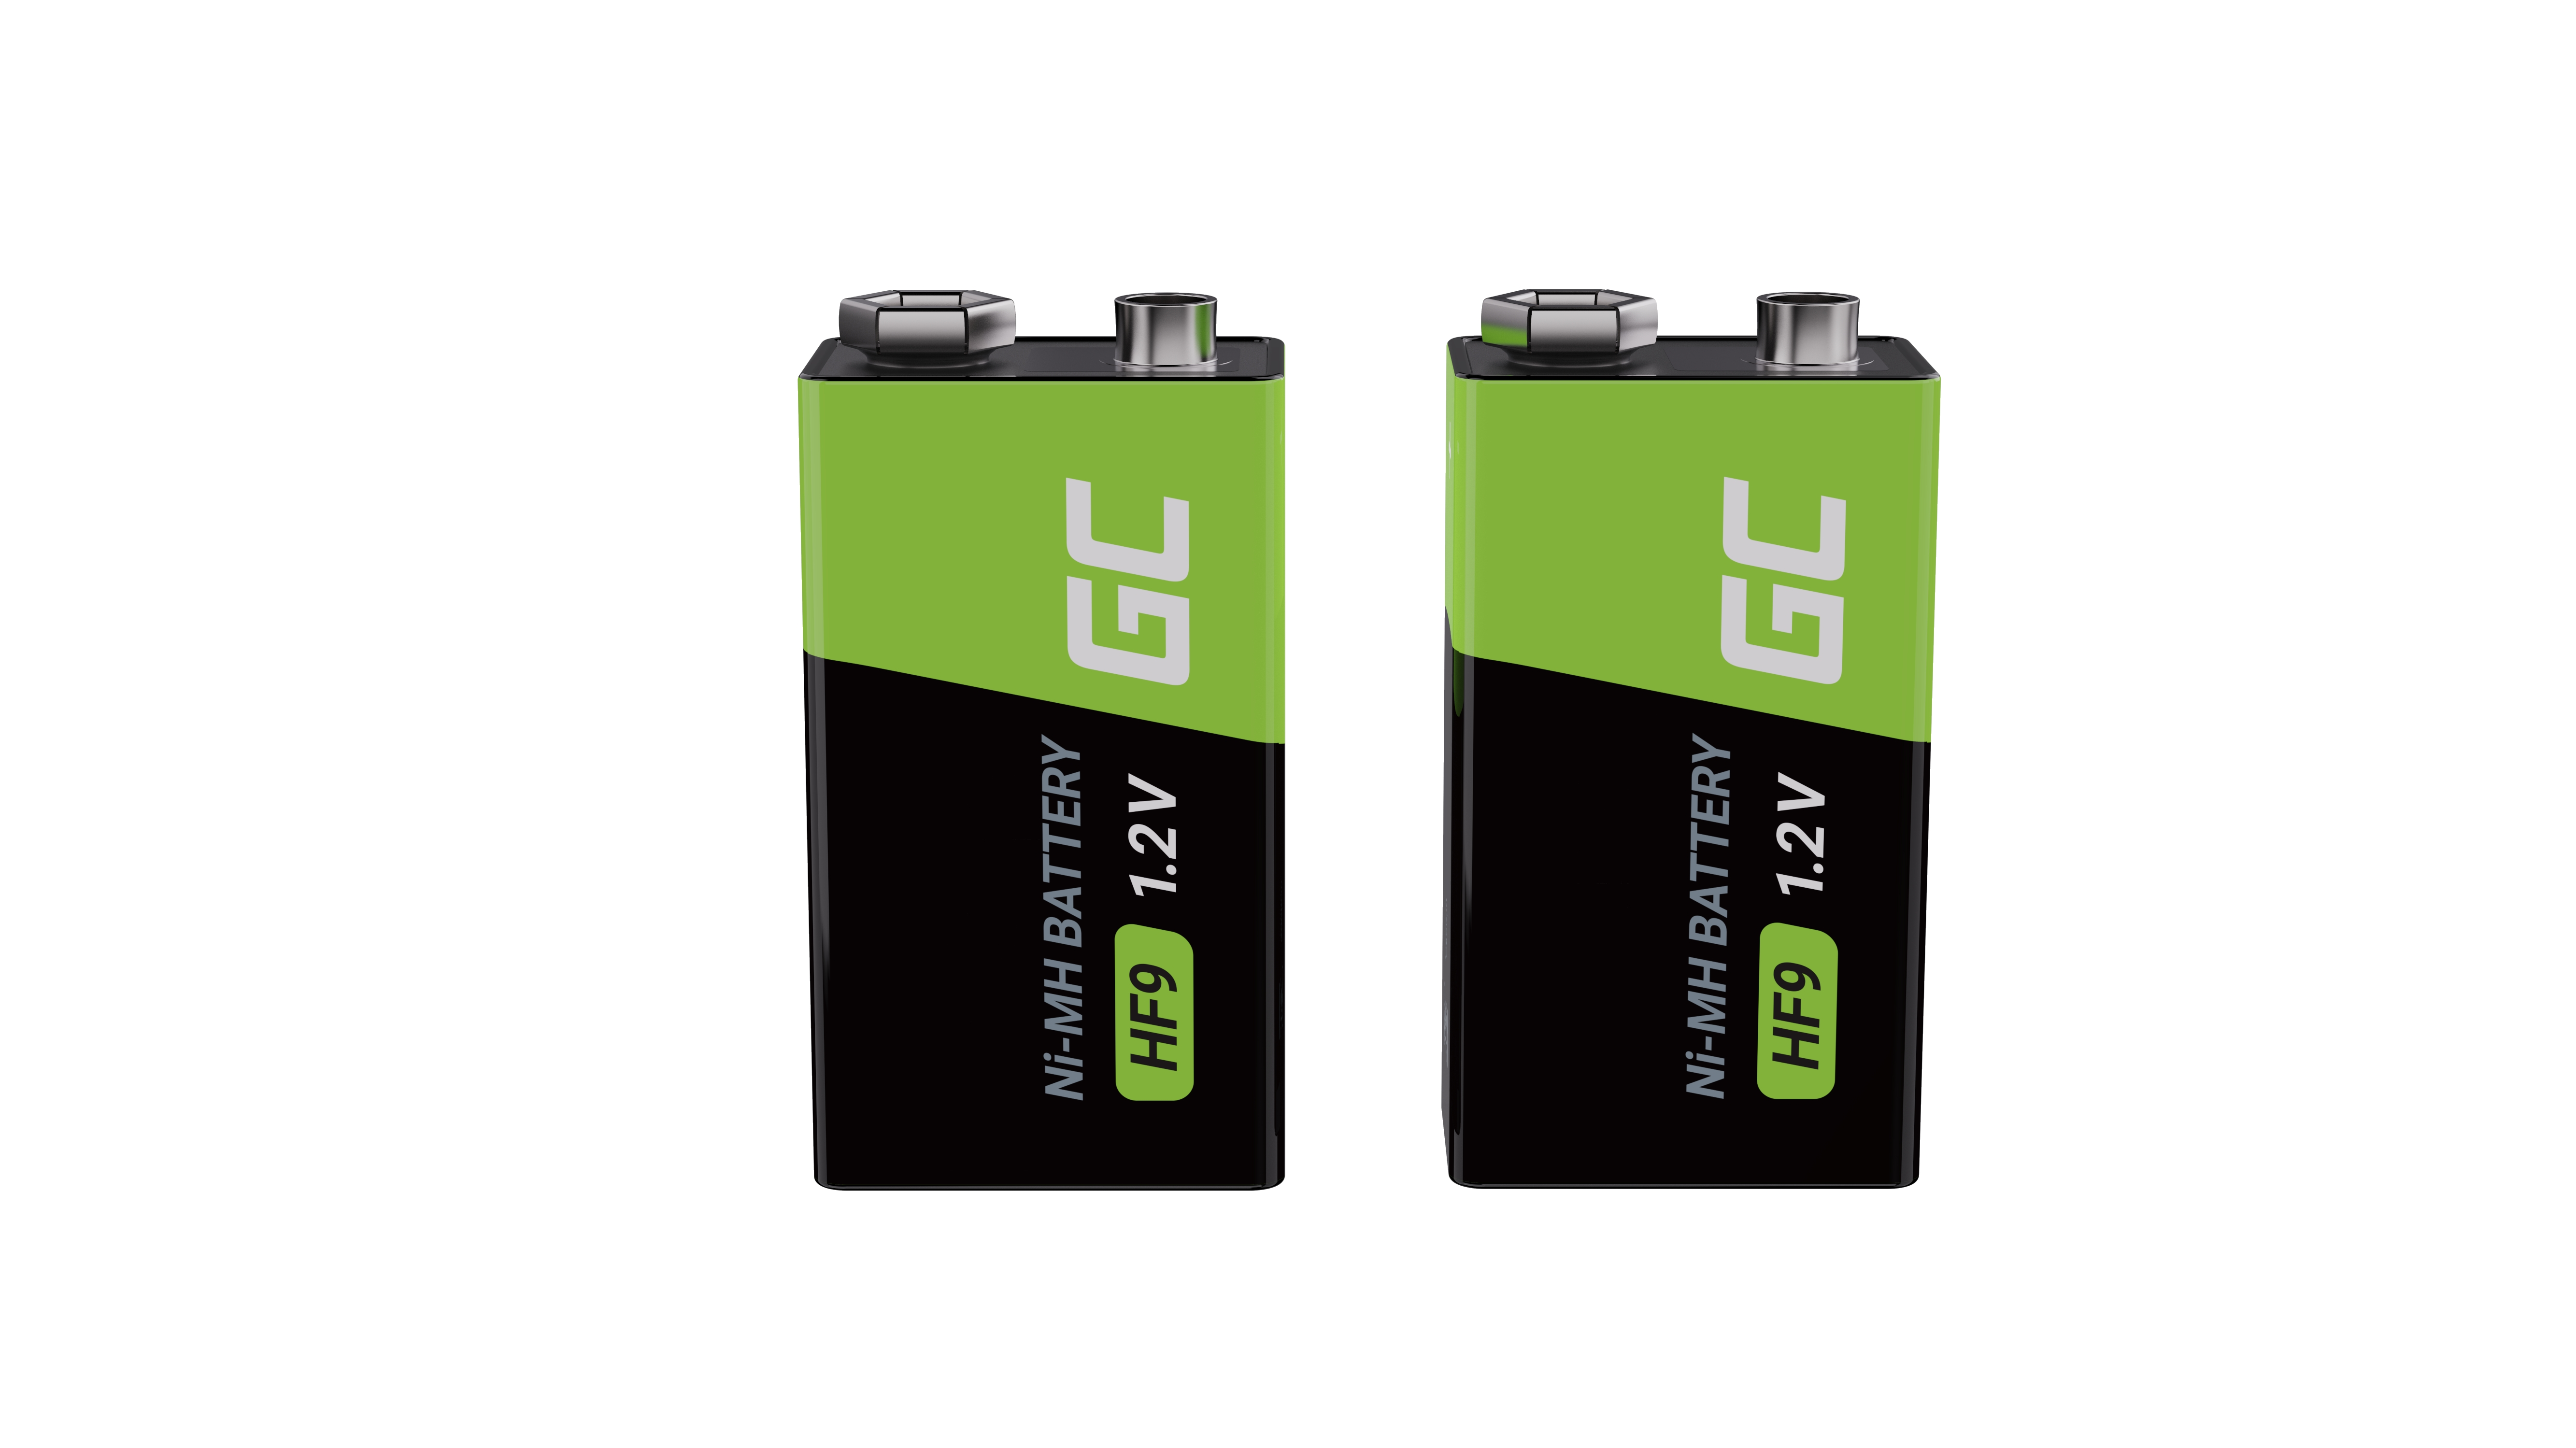 Battery 4x 9V HF9 Ni-MH 250mAh Green Cell